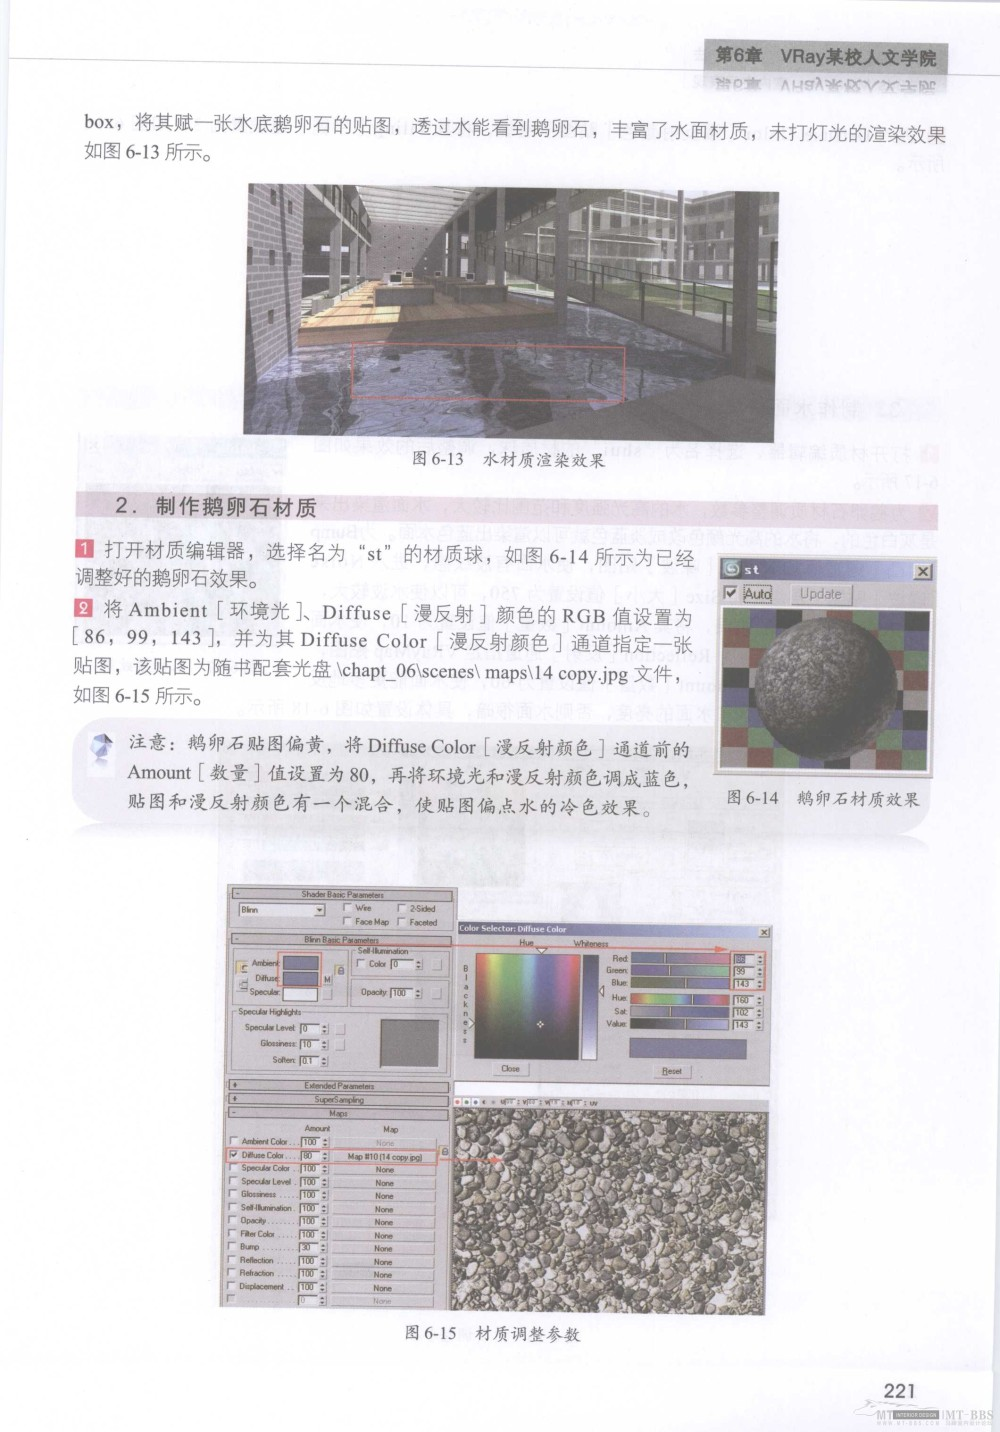 水晶石技法-3ds_Max&VRay室内空间表现_水晶石技法-3ds_Max&VRay室内空间表现_页面_227.jpg